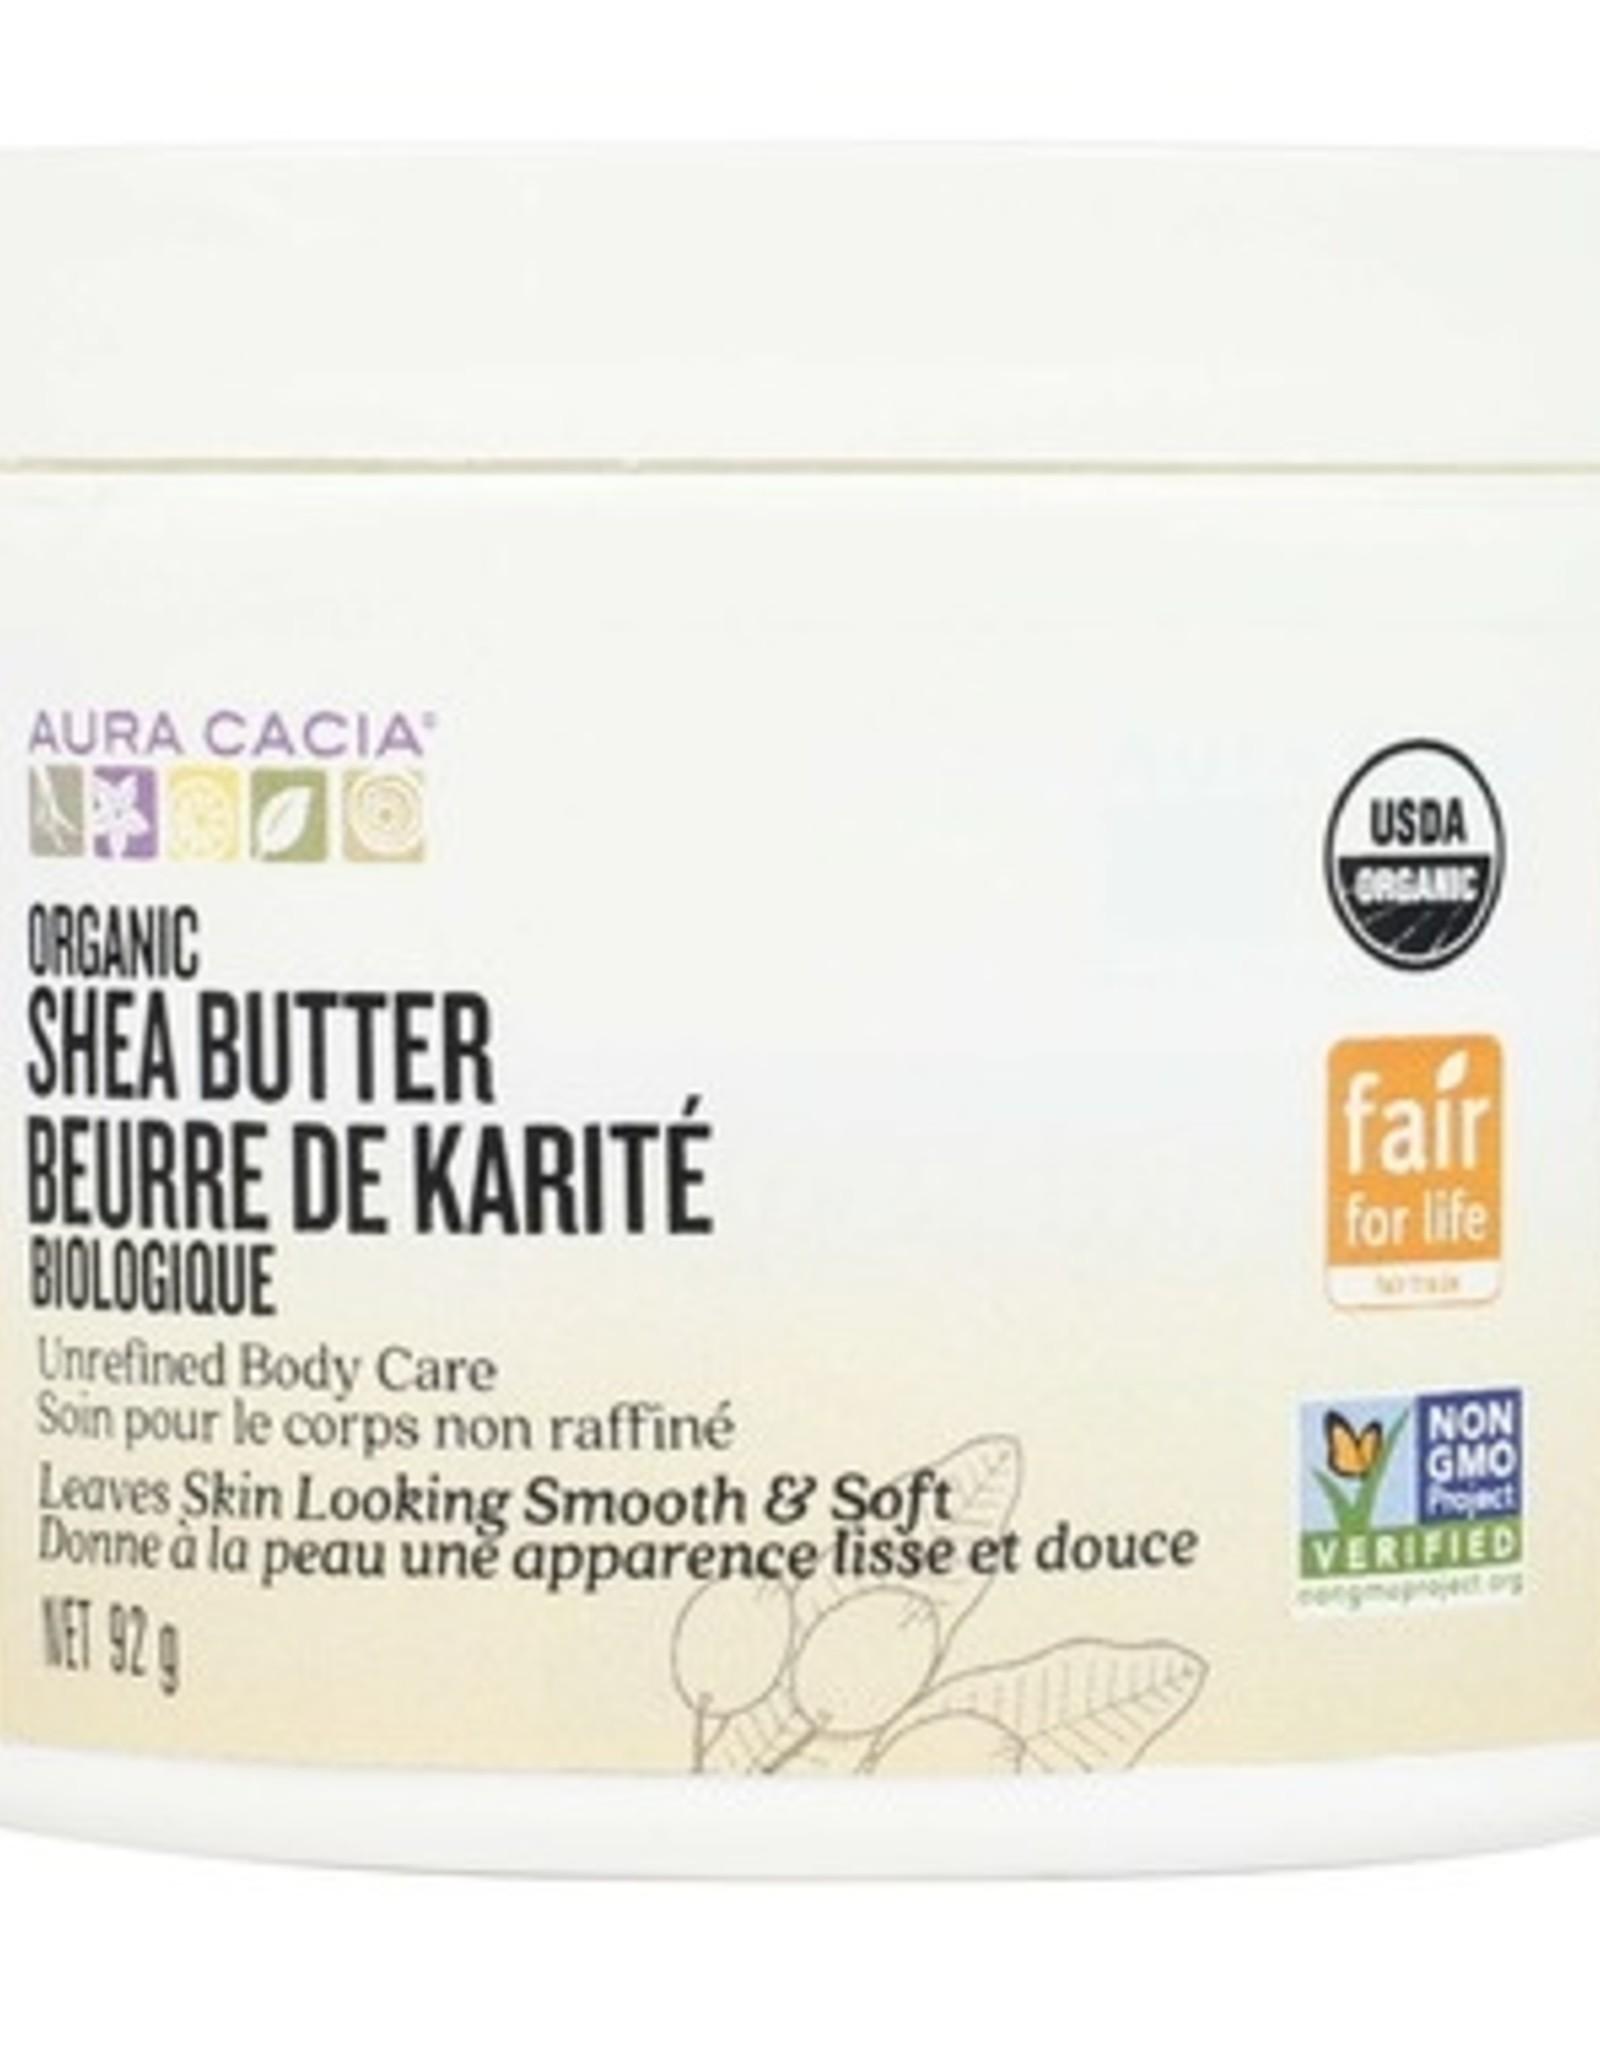 Aura Cacia Aura Cacia - Body Butter, Shea Butter (92g)